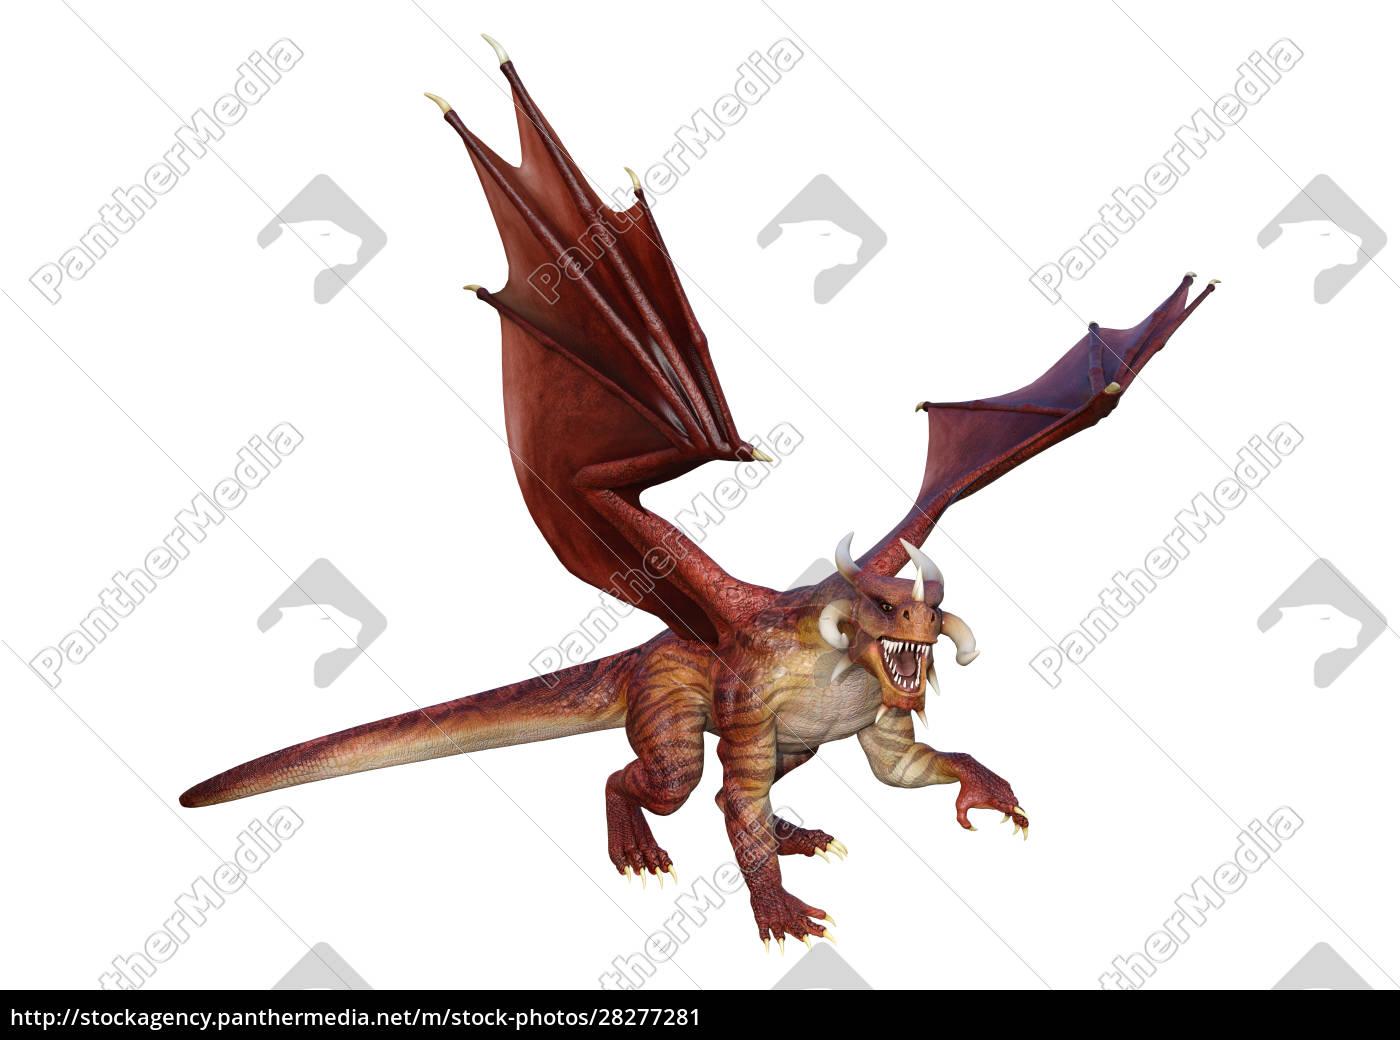 3d, rendering, fairy, tale, dragon, on - 28277281